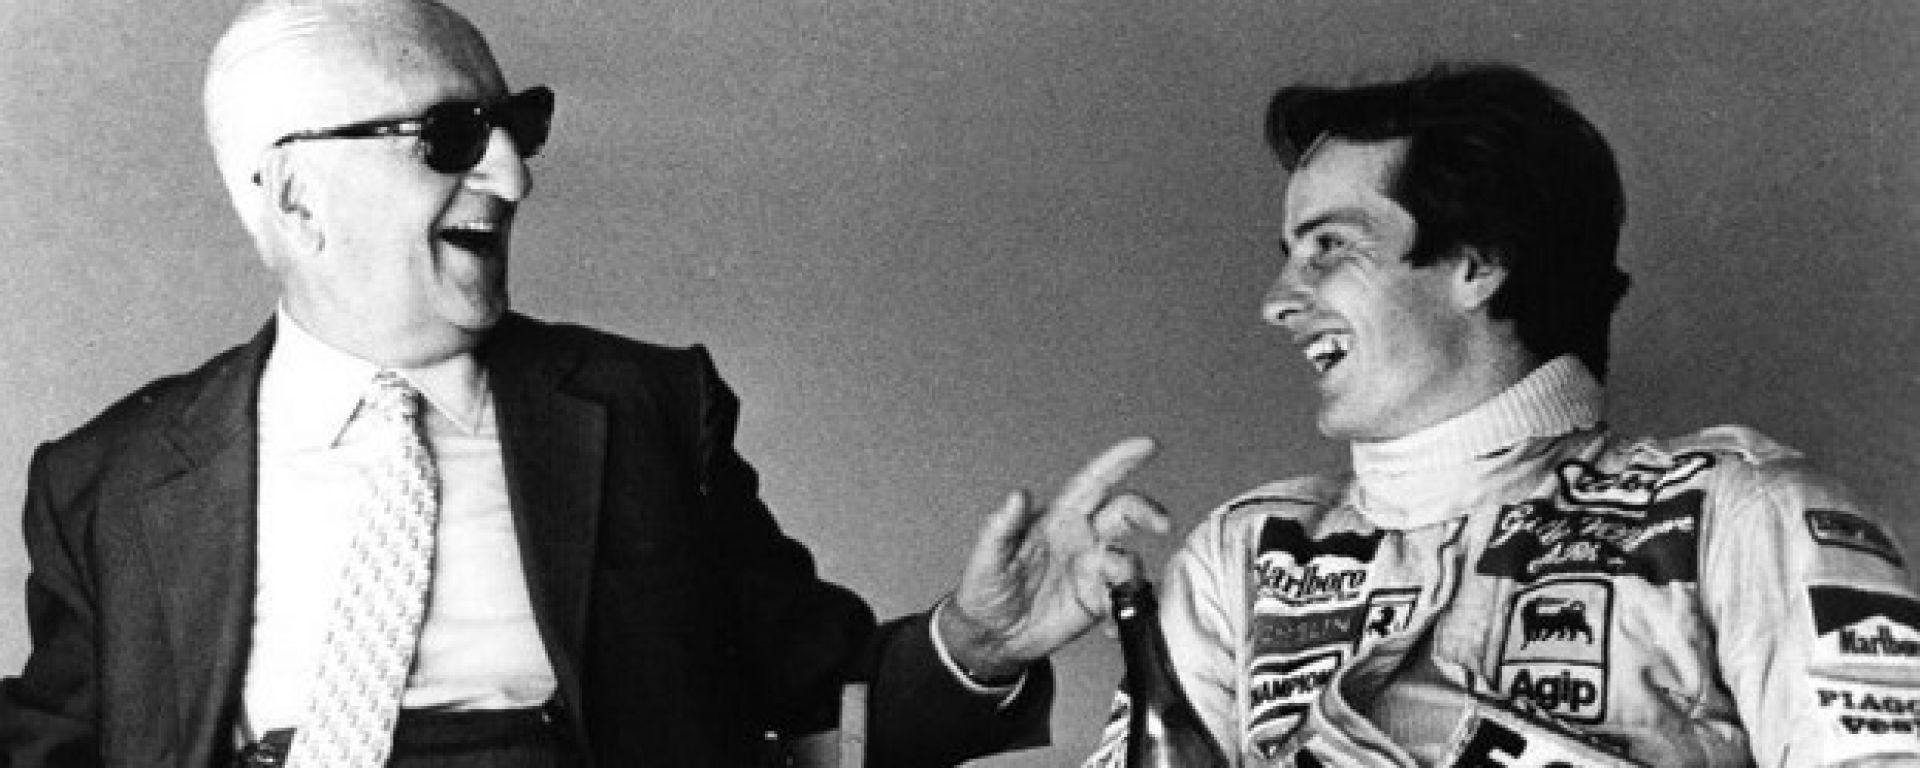 Enzo Ferrari e Gilles Villeneuve